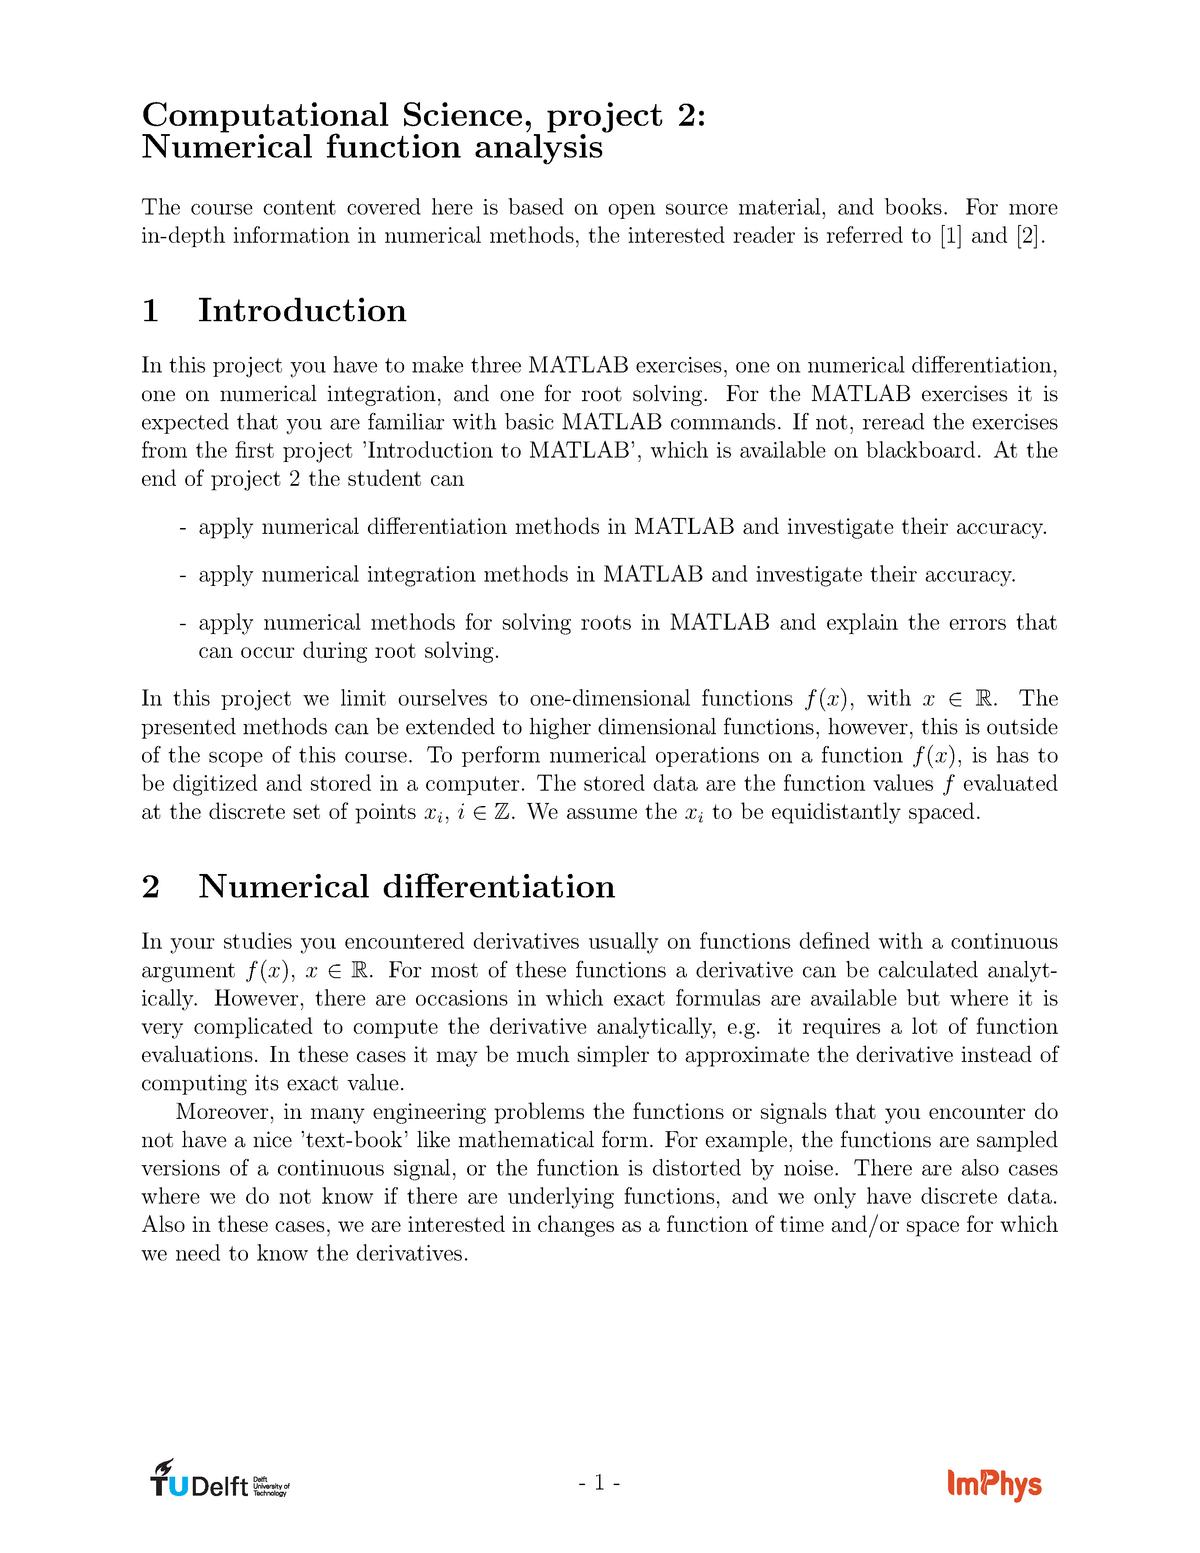 TN2513-Numerical function analysis - TN2513: Computational